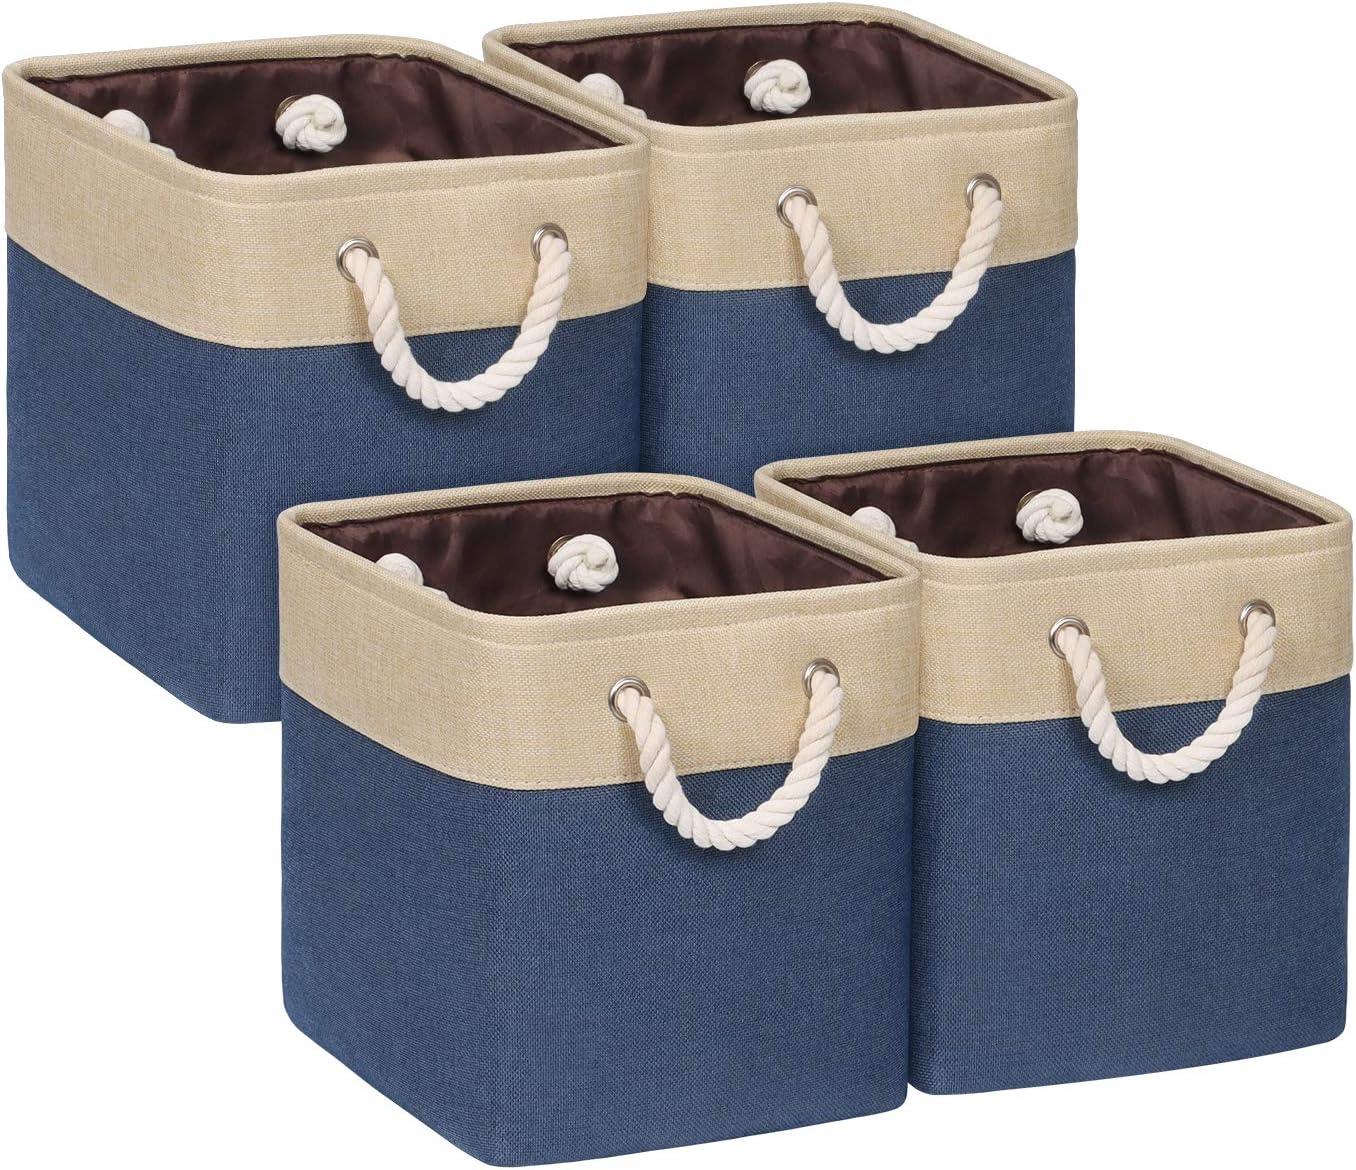 Univivi Cube Storage Bins [4-Pack] Blue Fabric Storage Cubes with Sturdy Cotton Carry Handles Storage Basket for Shelf Closet Nursery Home Office Organizing (10.5